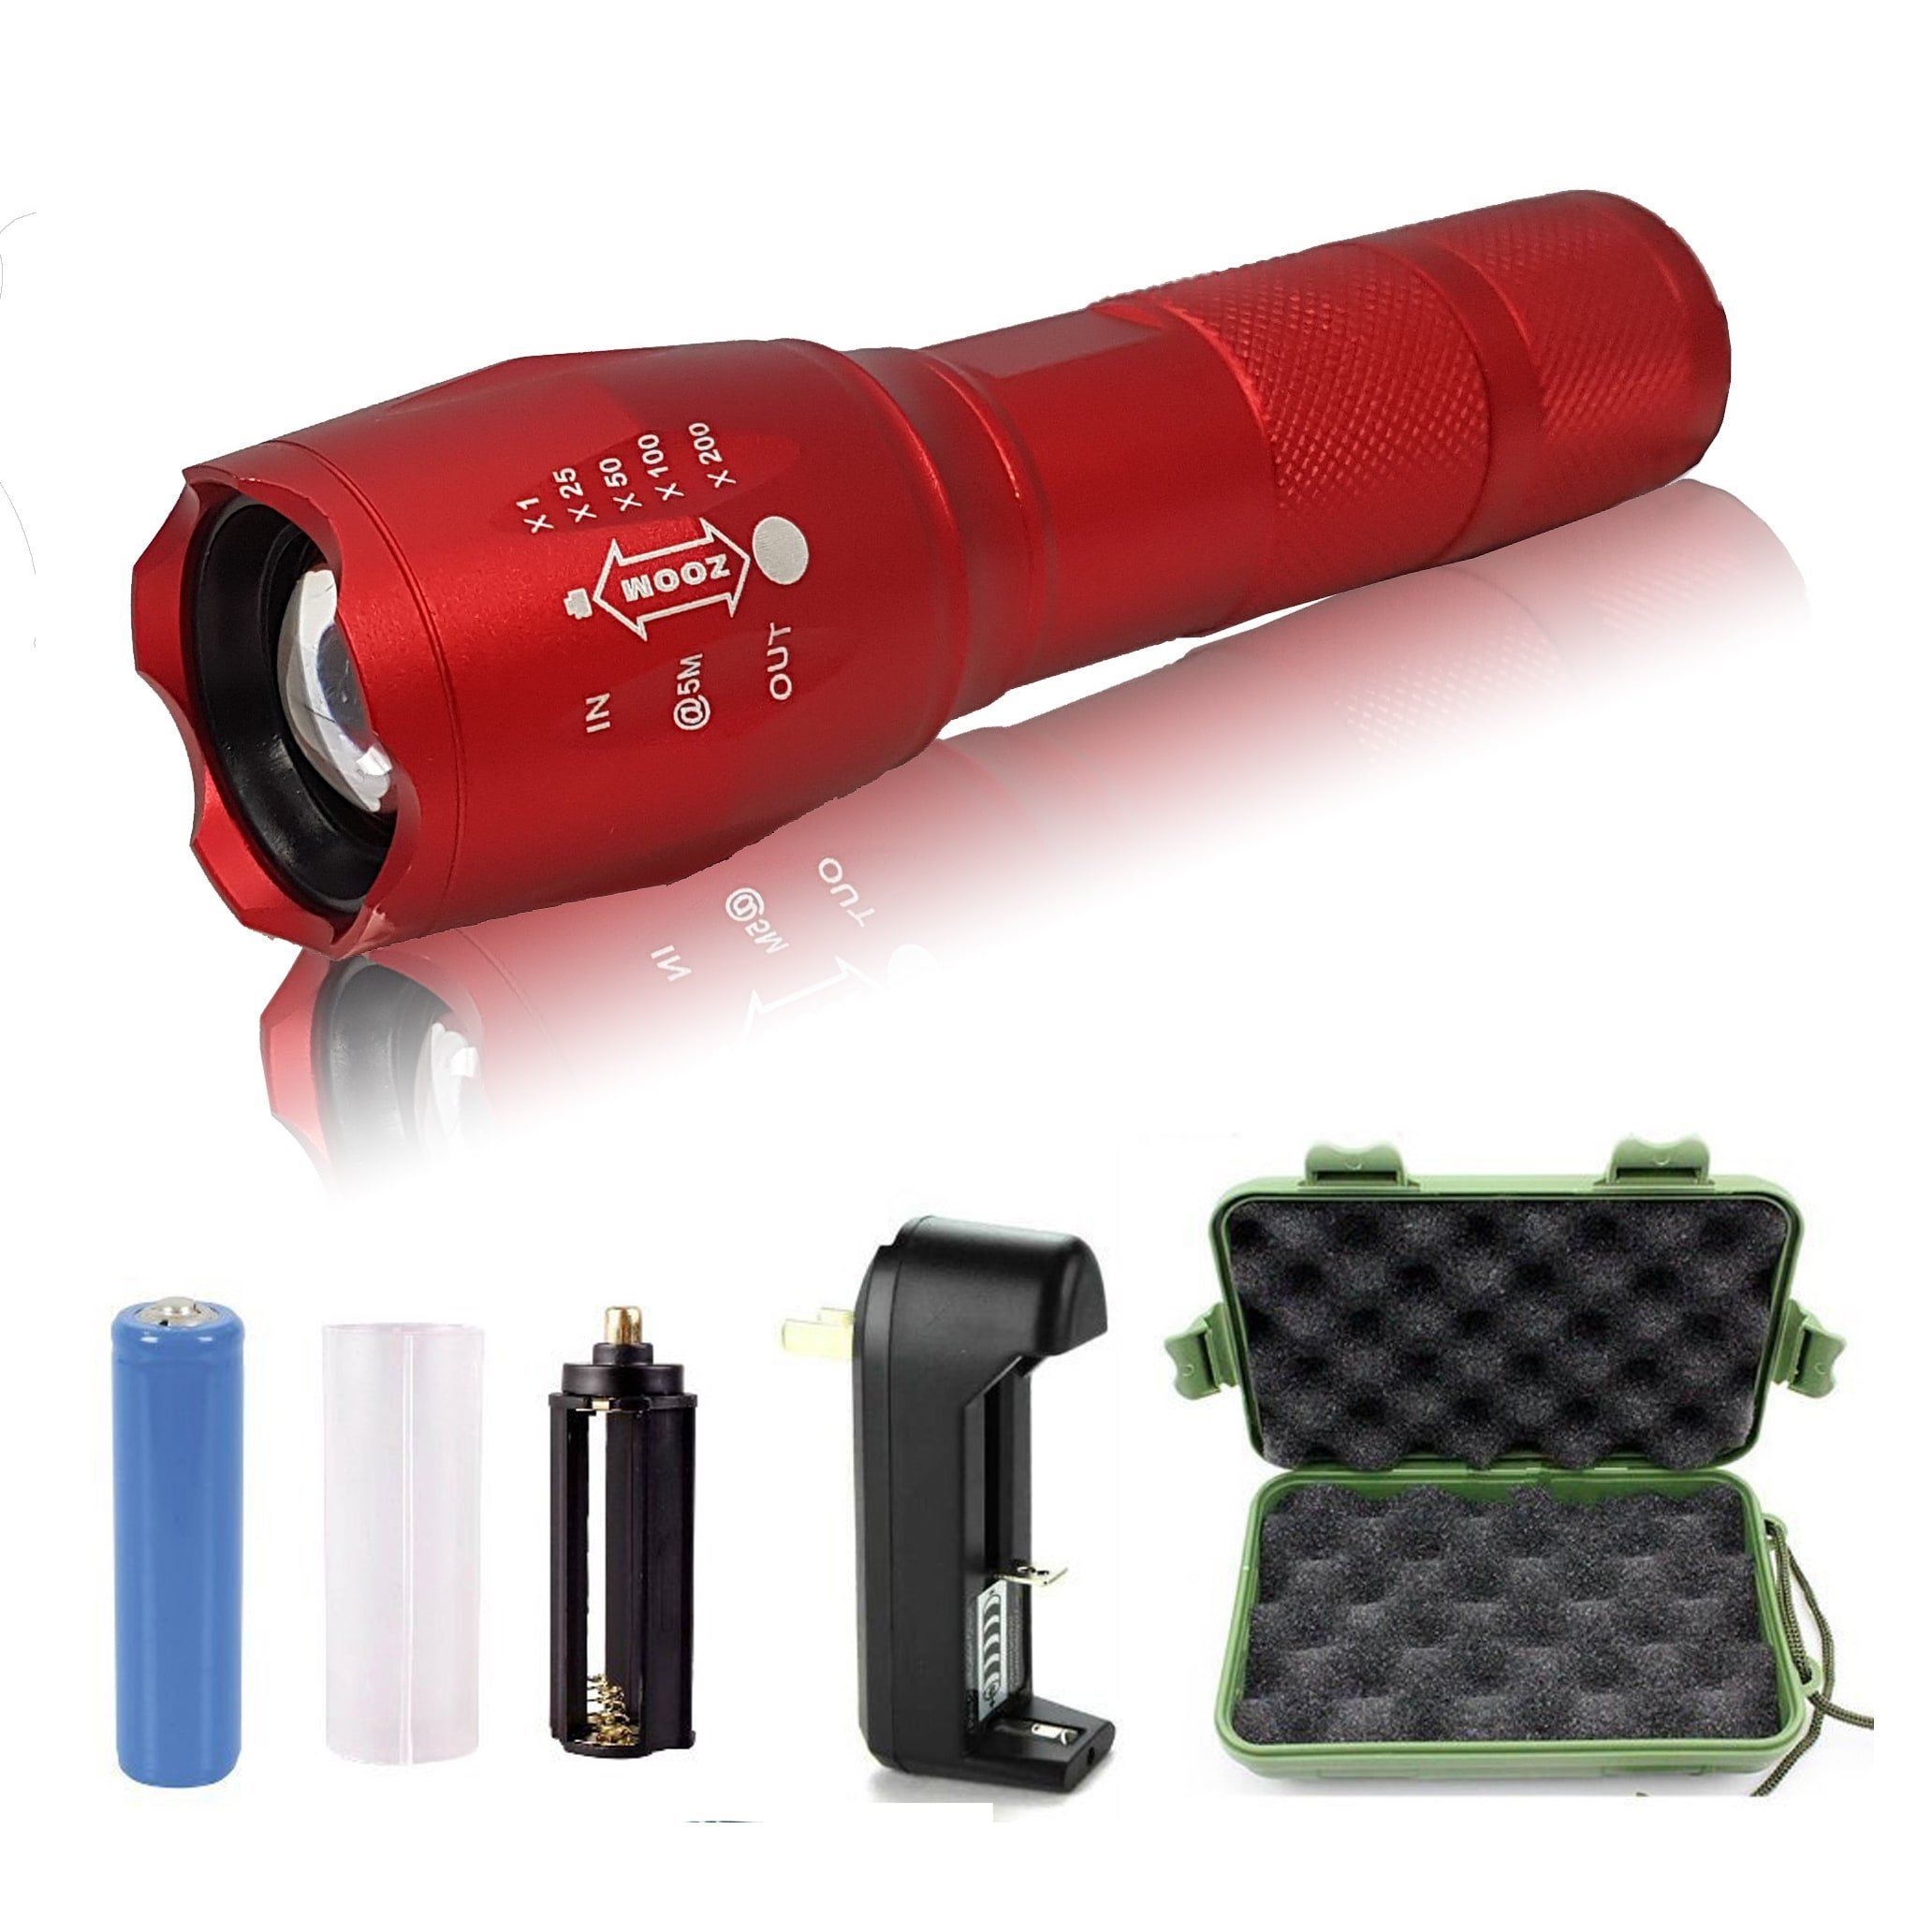 5starsuperdeals Rechargable Plastic/Aluminum 5-mode, Adjustable-focus, Ultra-bright LED Flashlight Kit Red